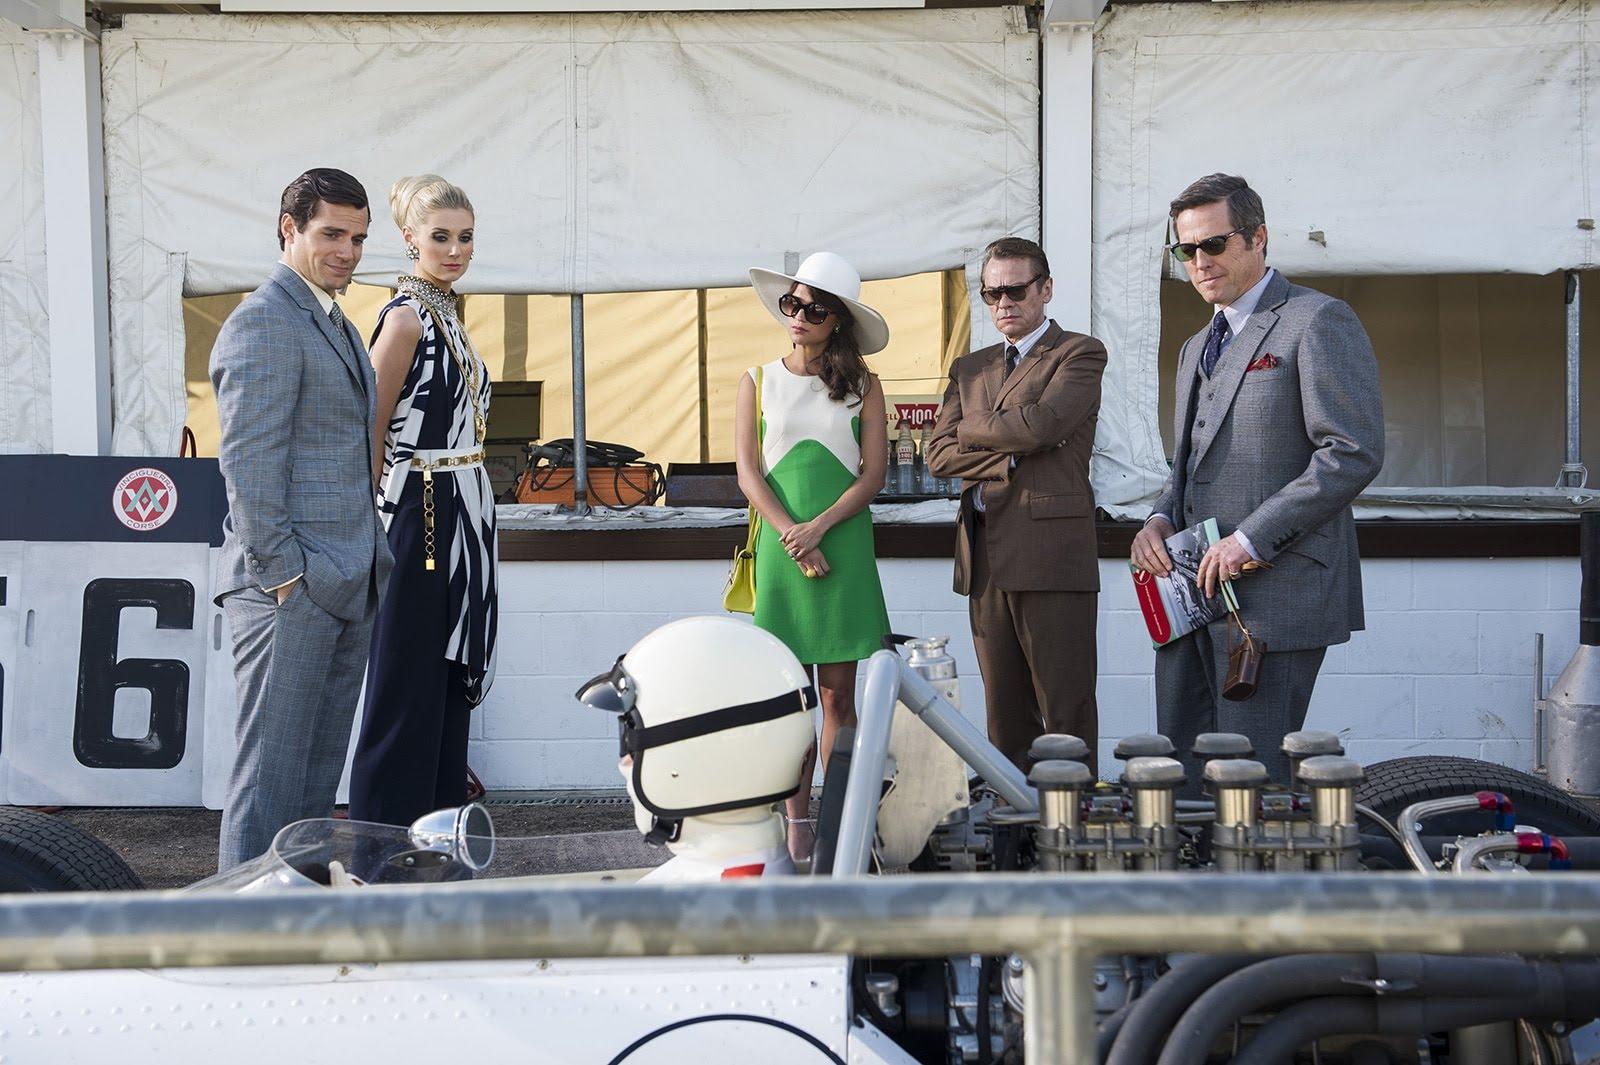 Agents très spéciaux - Code U.N.C.L.E: Sylvester Groth, Alicia Vikander, Elizabeth Debicki, Hugh Grant, Henry Cavill